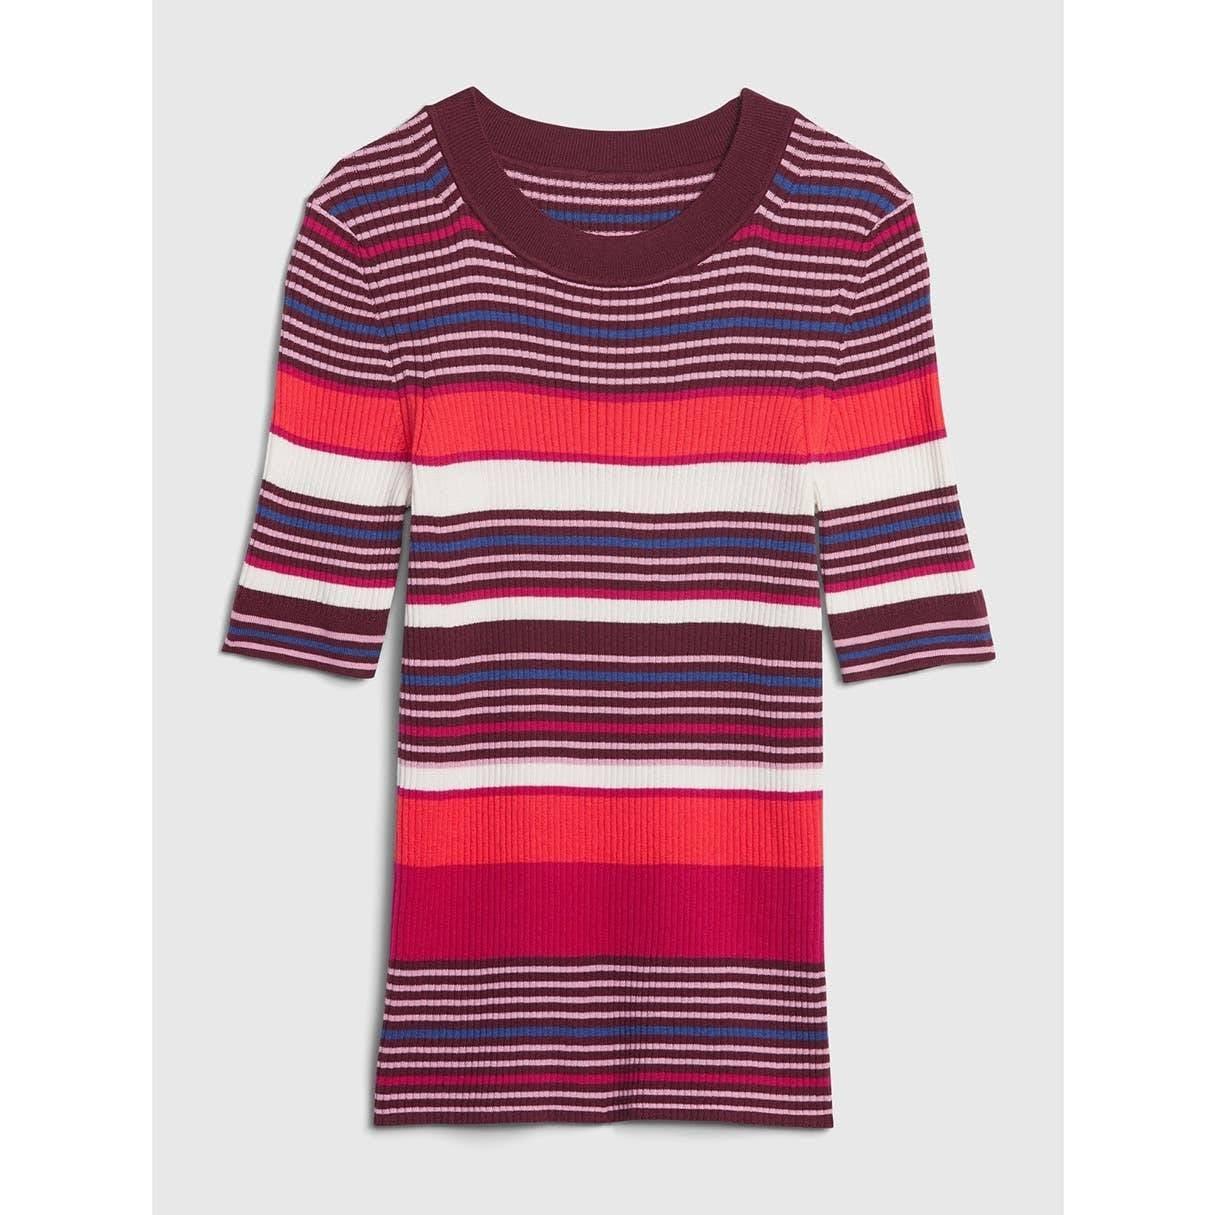 Striped Rib Knit Top T Shirt Thermal